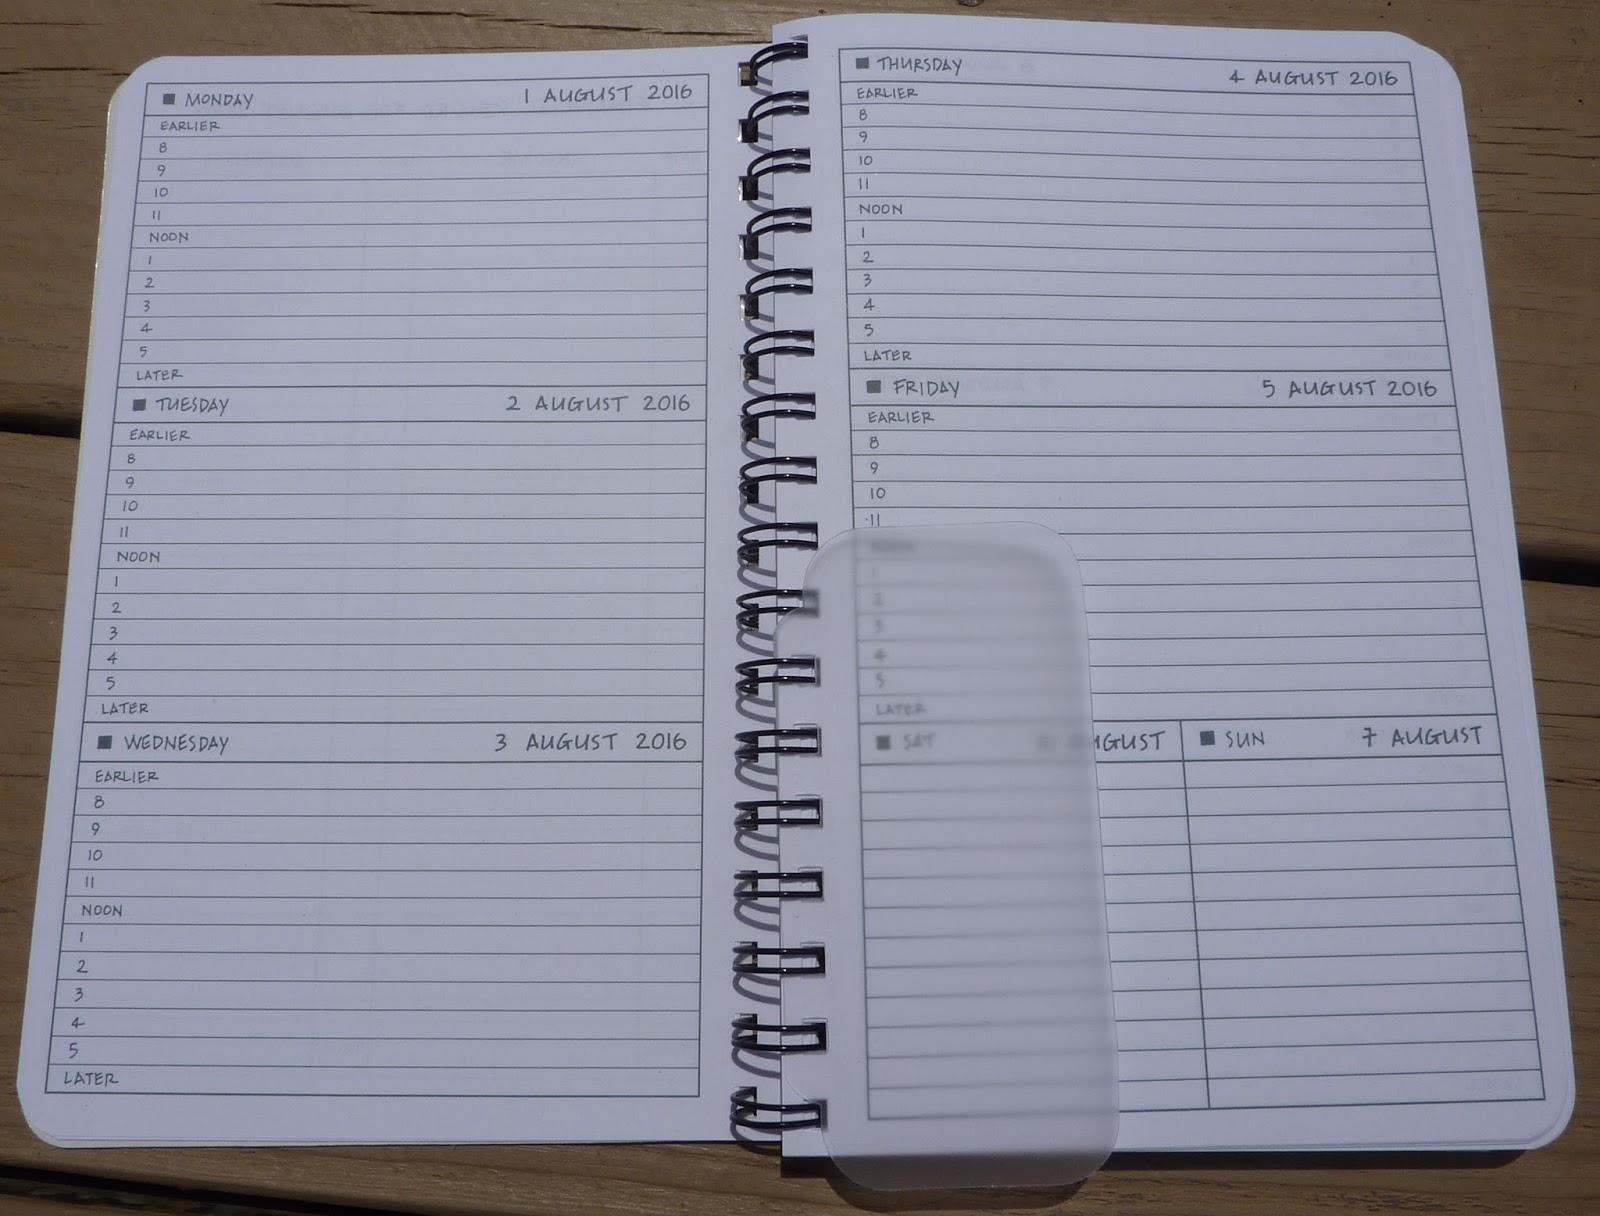 Calendar Planner Vb : Plannerisms august to calendar organizer by mixed